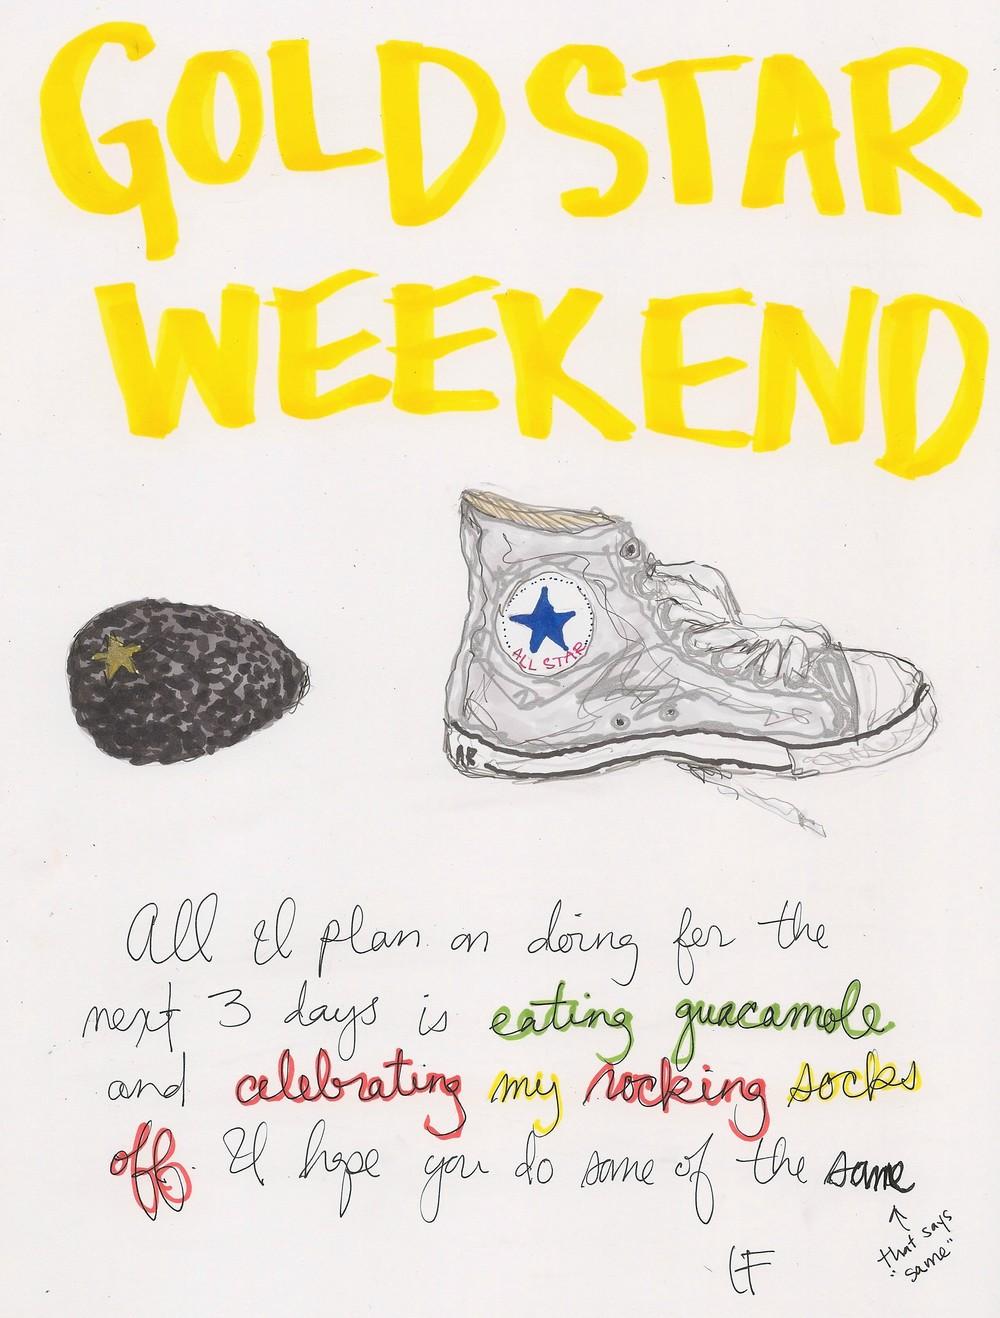 goldstarweekend1-e1309553583860.jpg